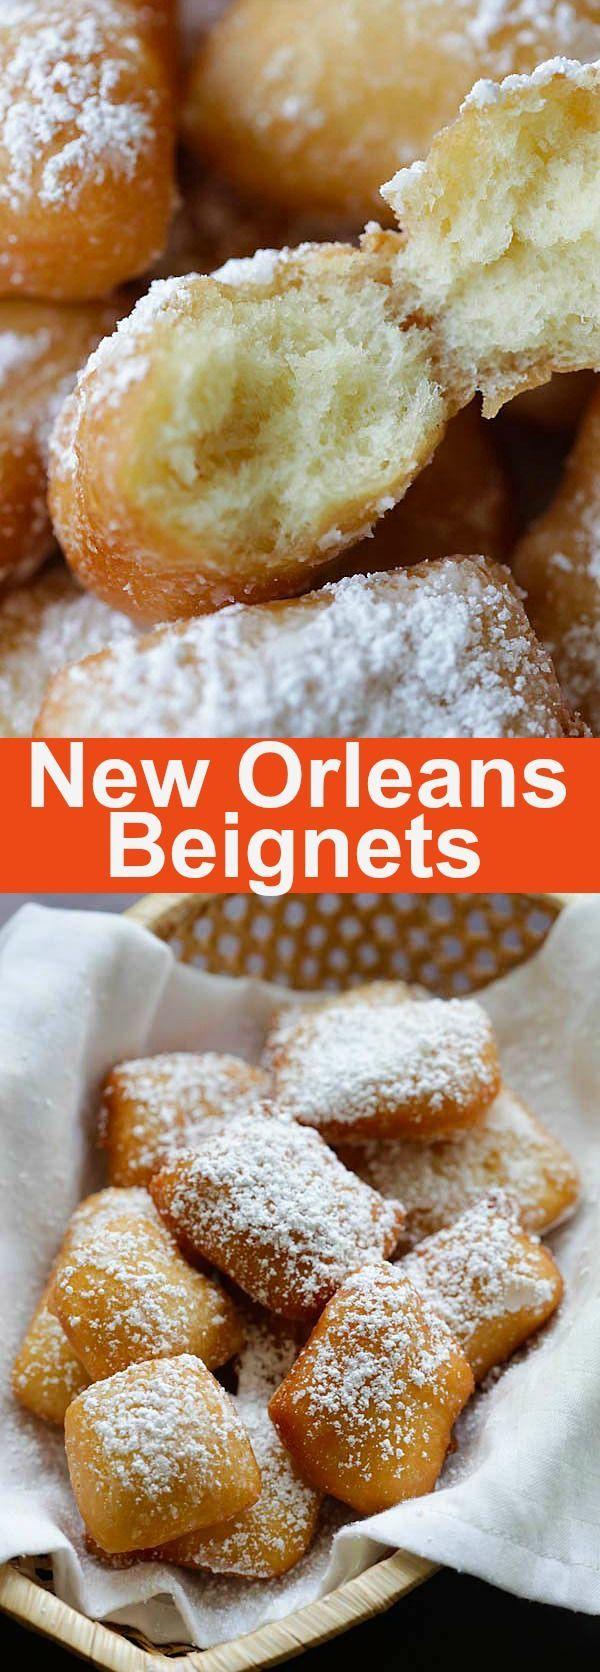 New Orleans Food Benyas Recipes